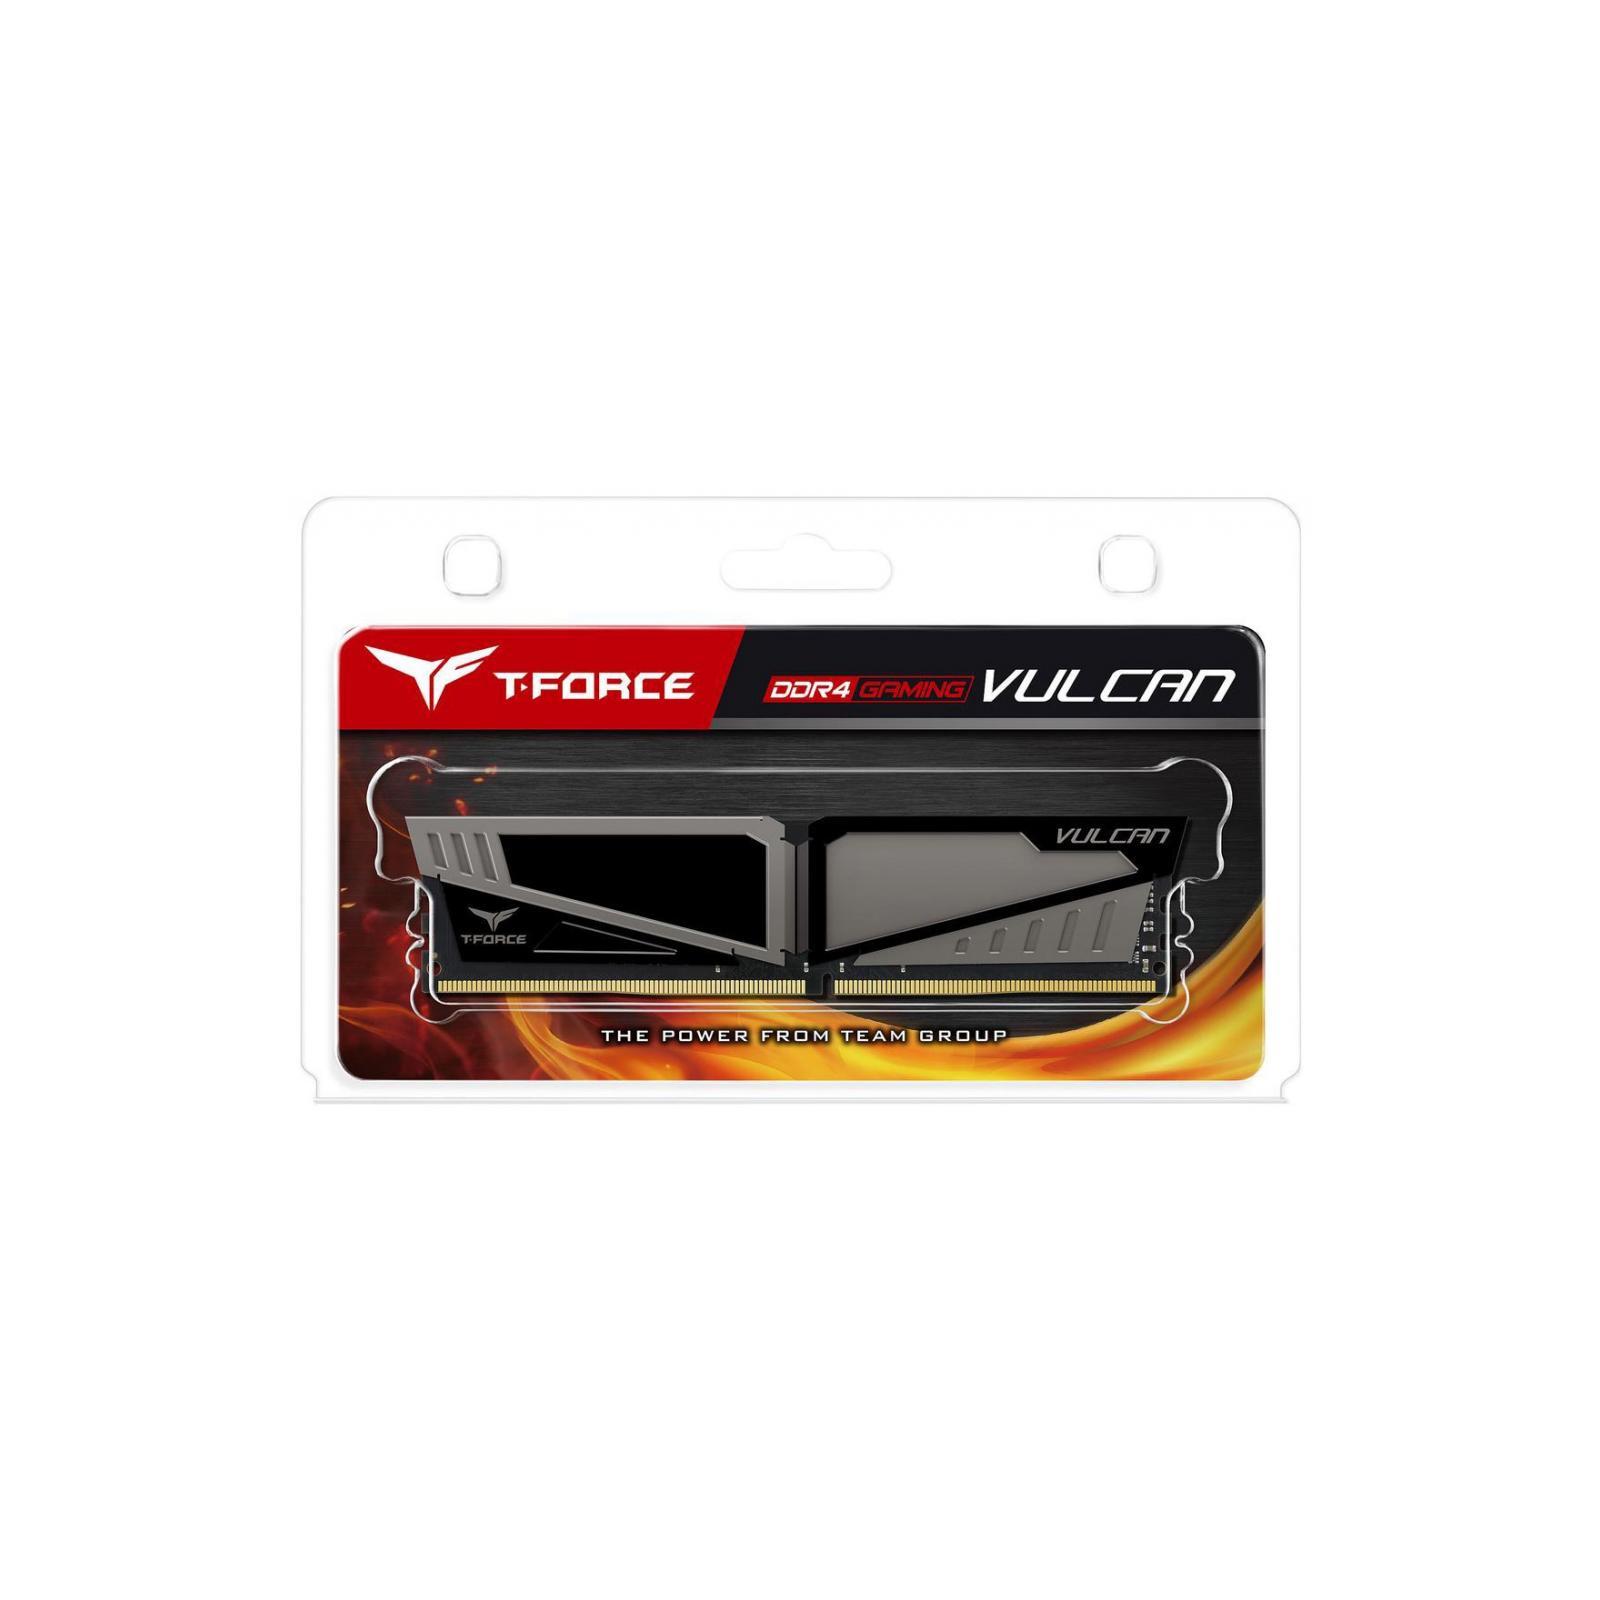 Модуль памяти для компьютера DDR4 8GB 2666 MHz T-Force Vulcan Gray Team (TLGD48G2666HC15B01) изображение 5